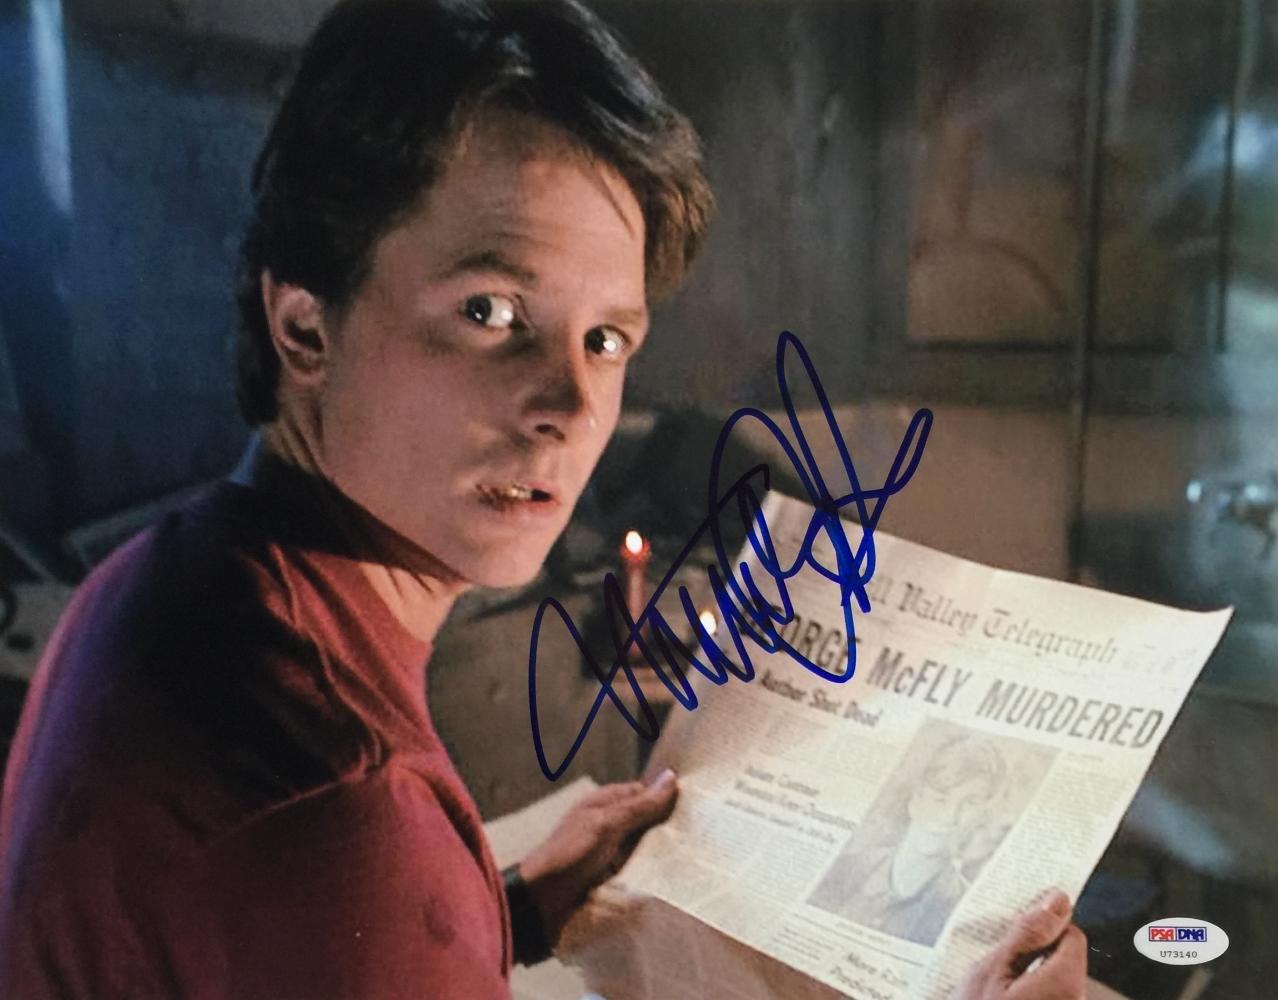 Michael J Fox Signature